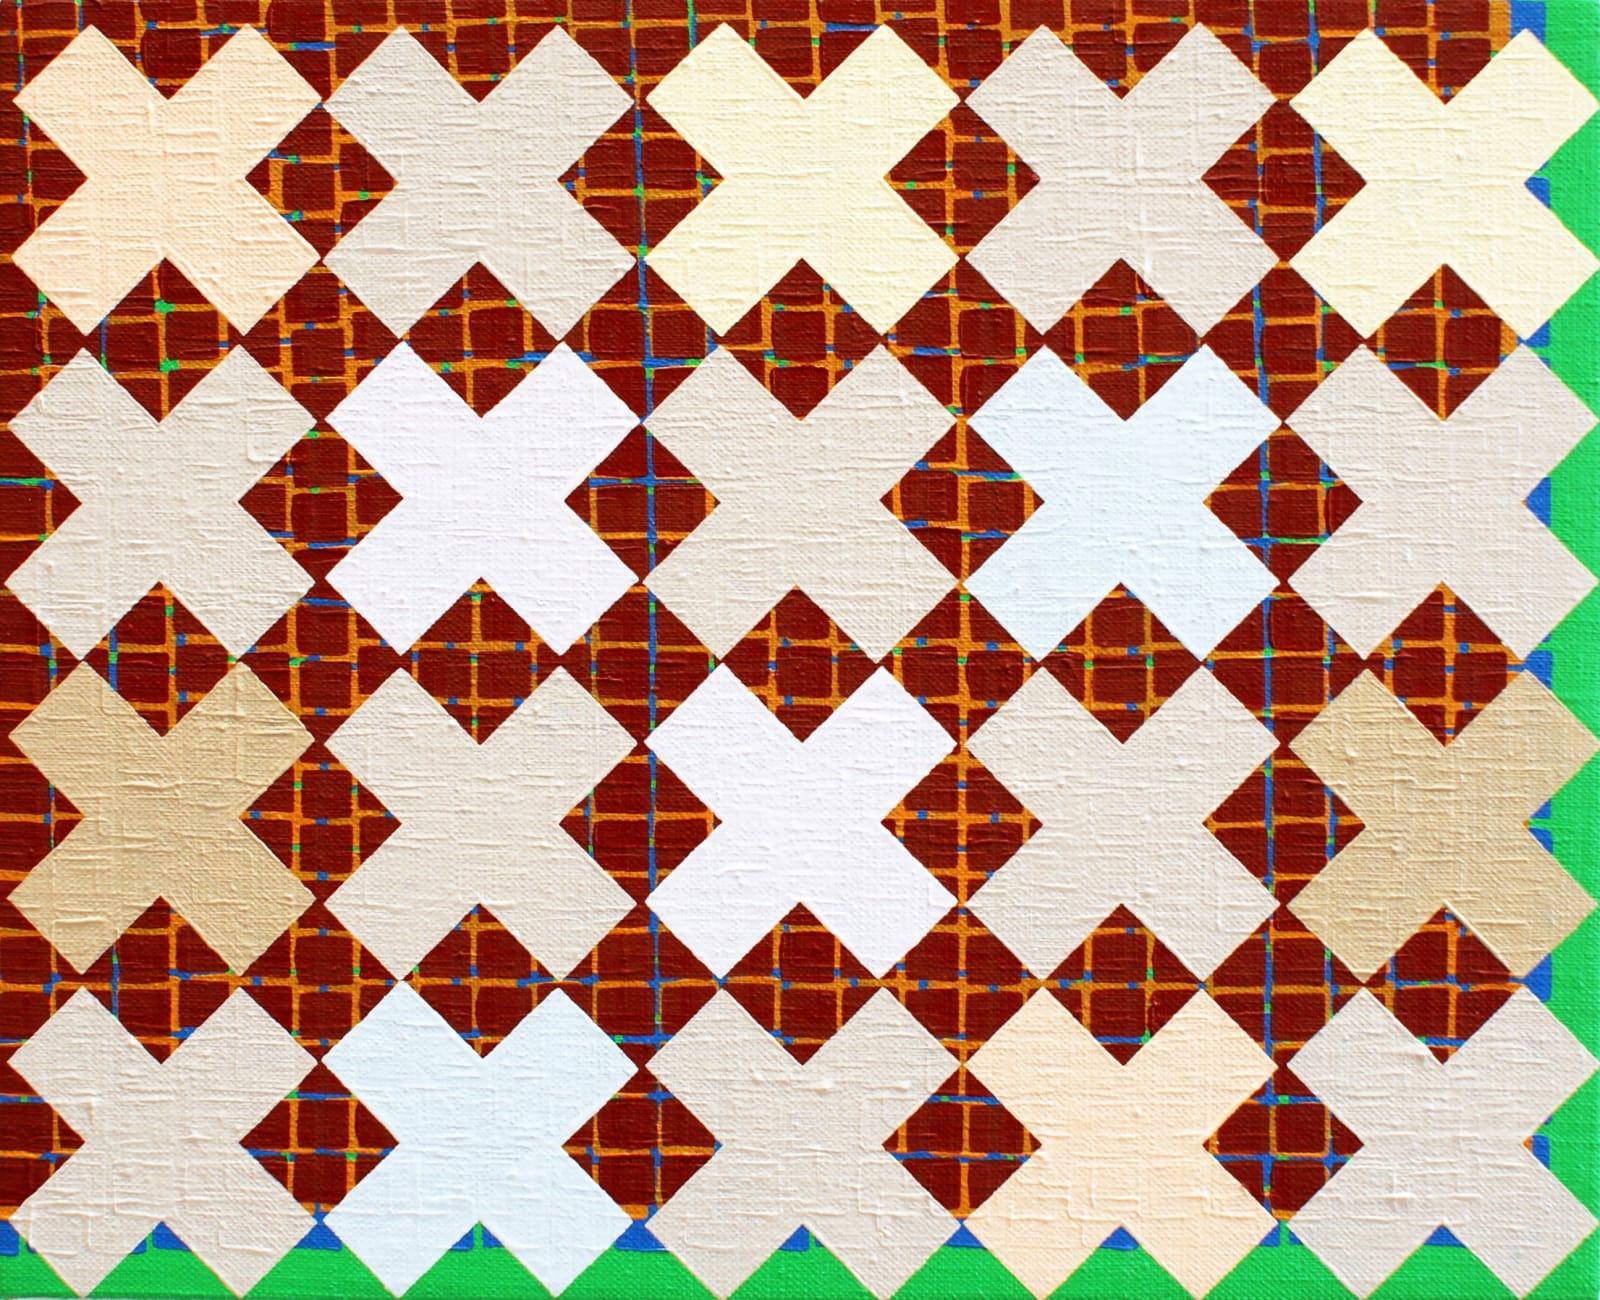 Helen Blake Blanket Oil on linen, laid on board 26 x 32 cm